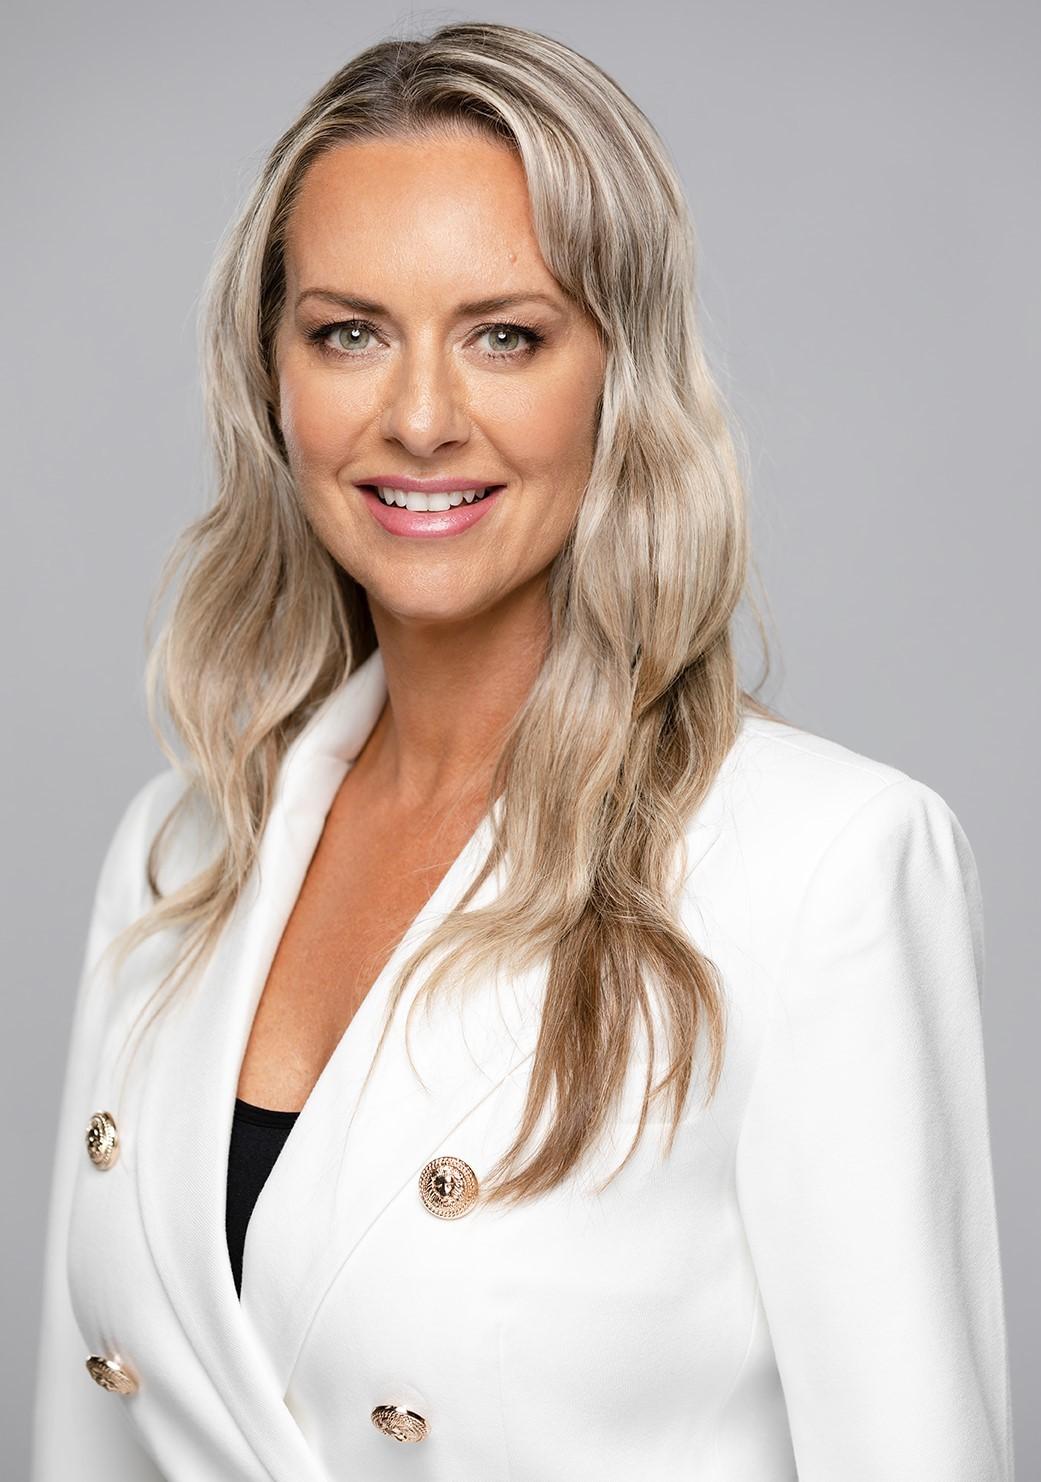 Nicole Cardow